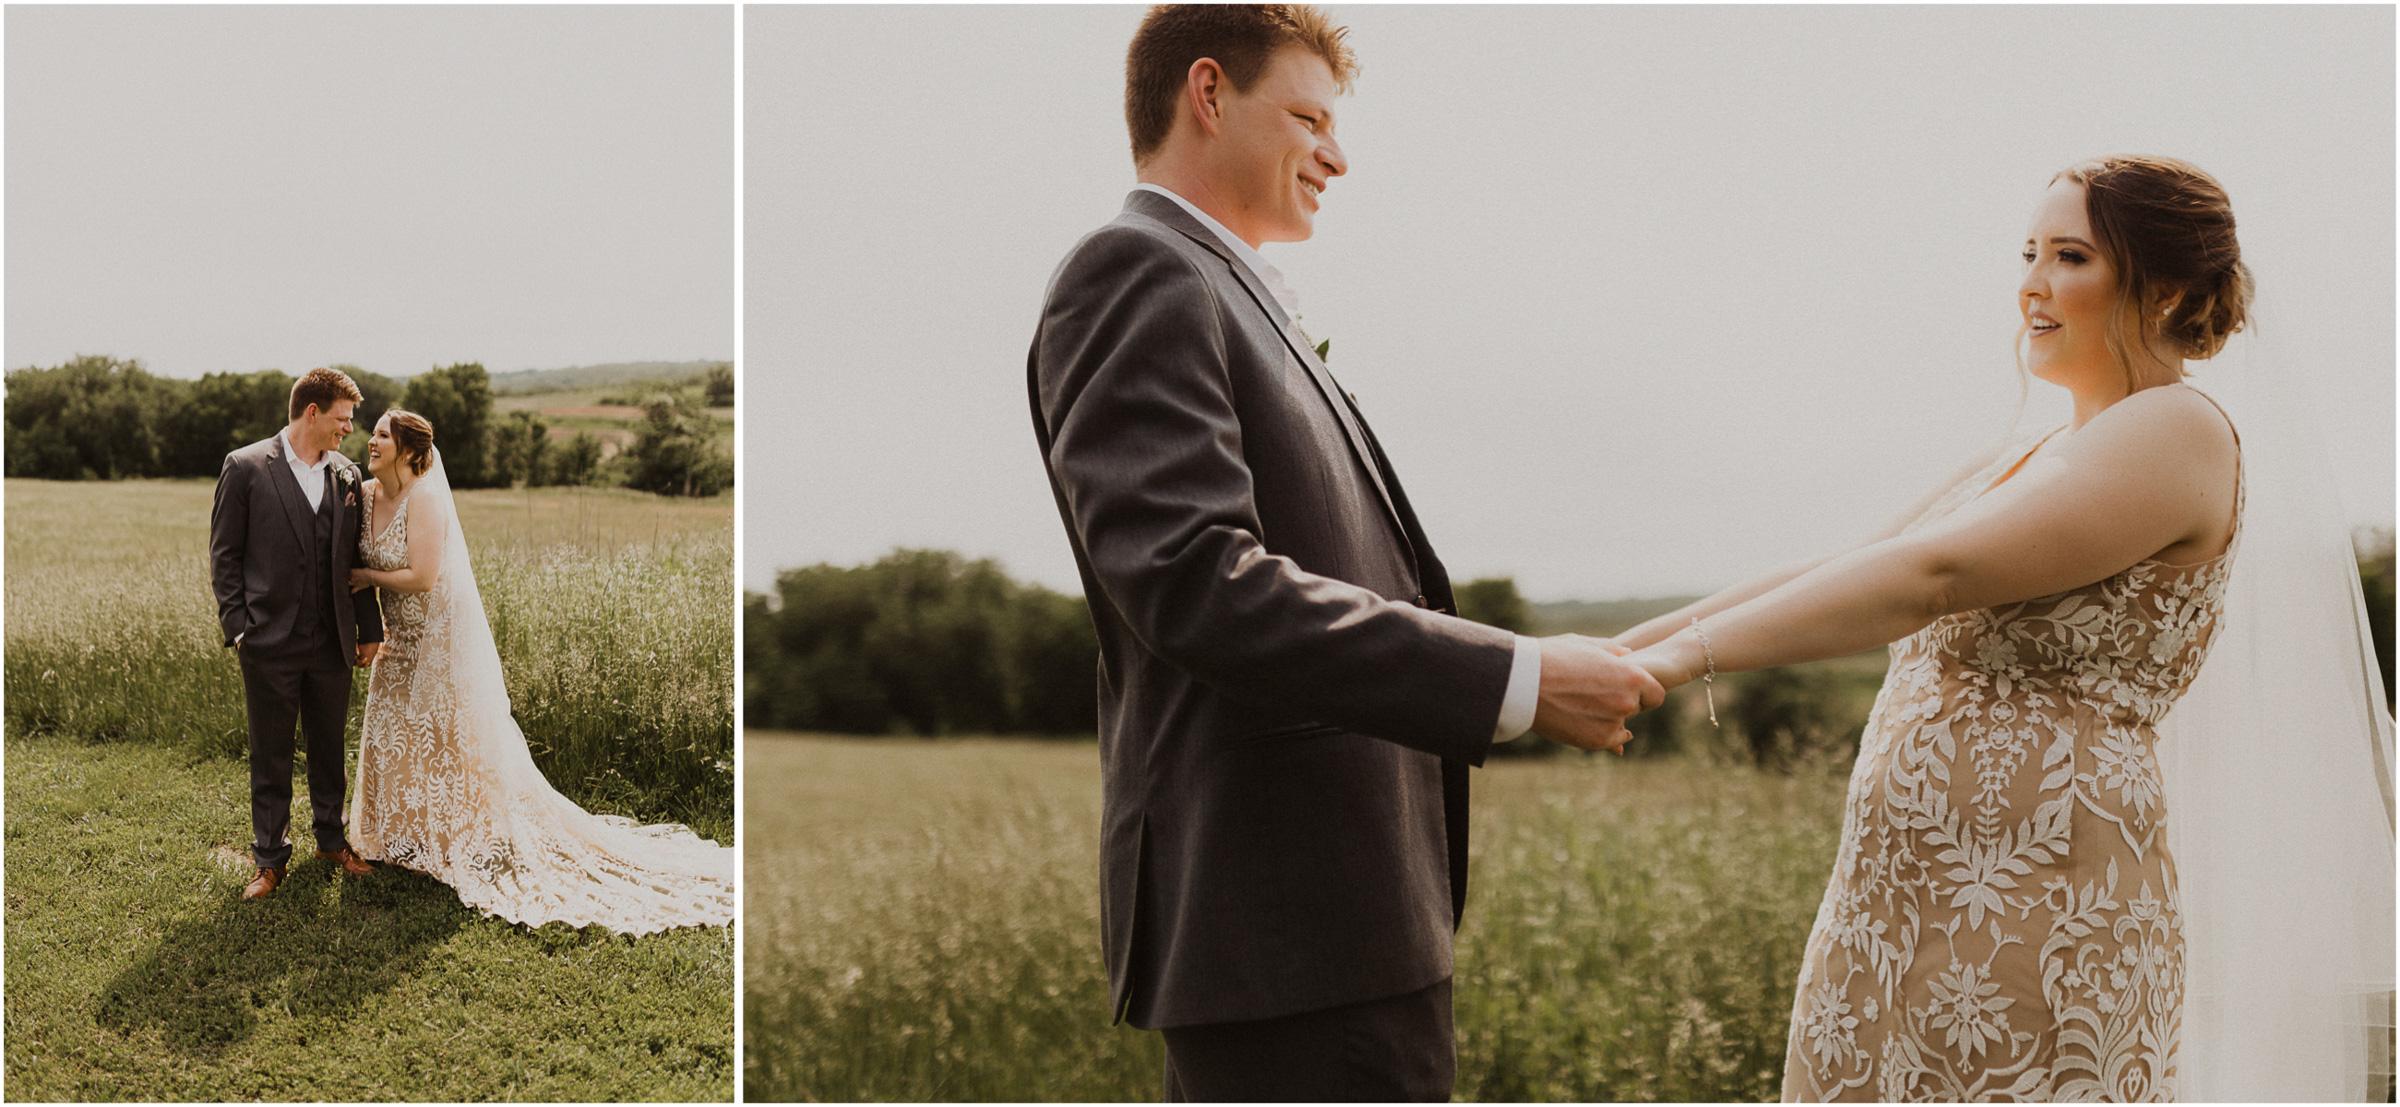 alyssa barletter photography weston red barn farm timberbarn summer outdoor wedding-34.jpg